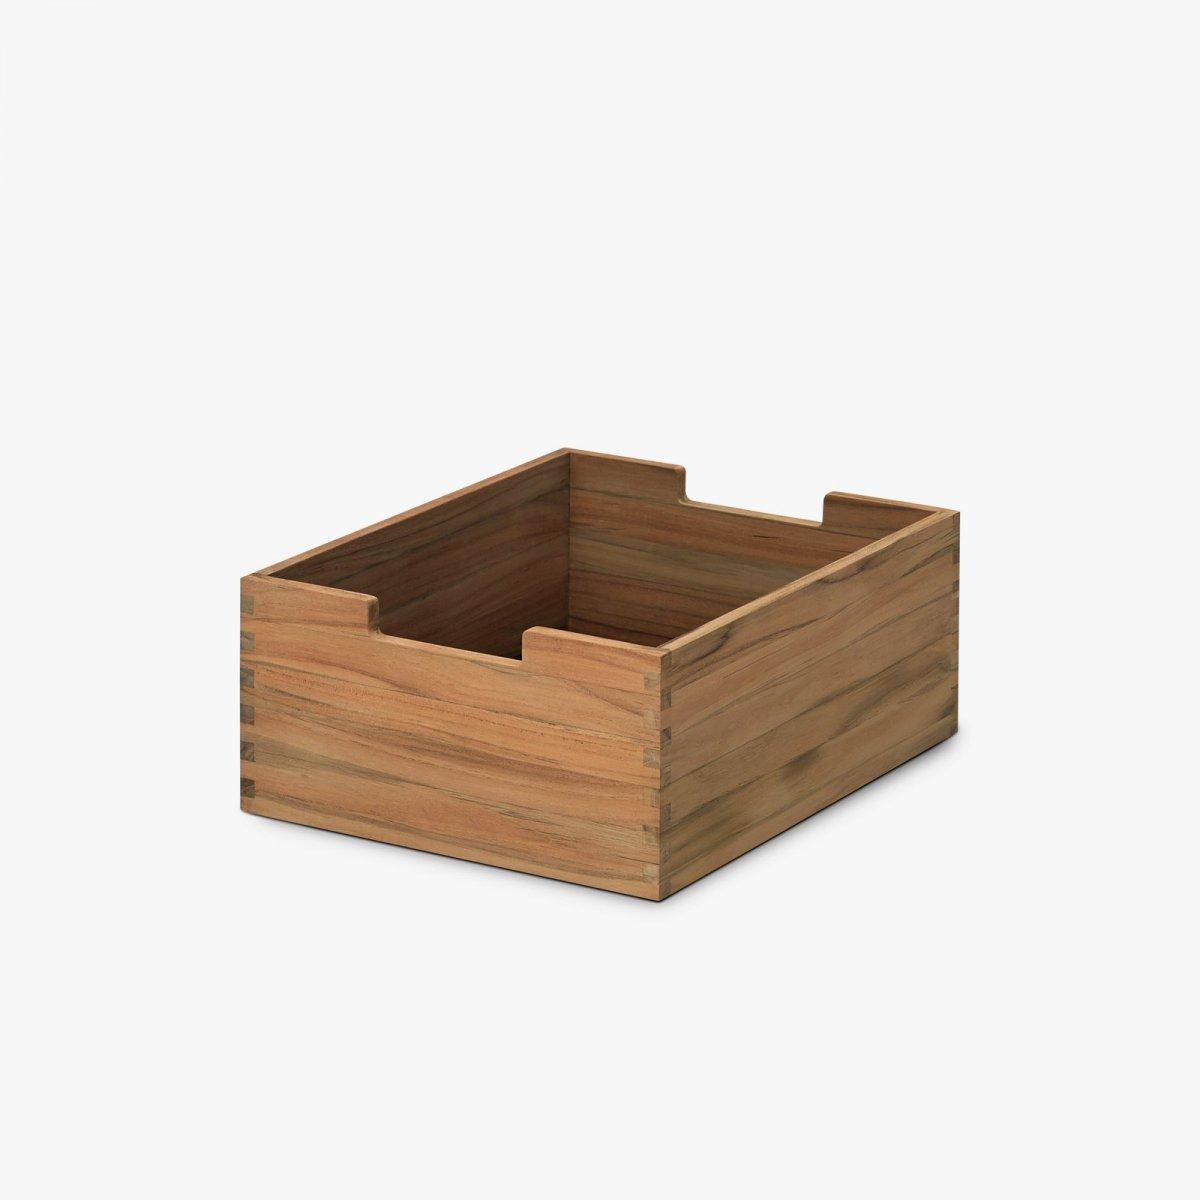 Cutter Box, Low, teak.